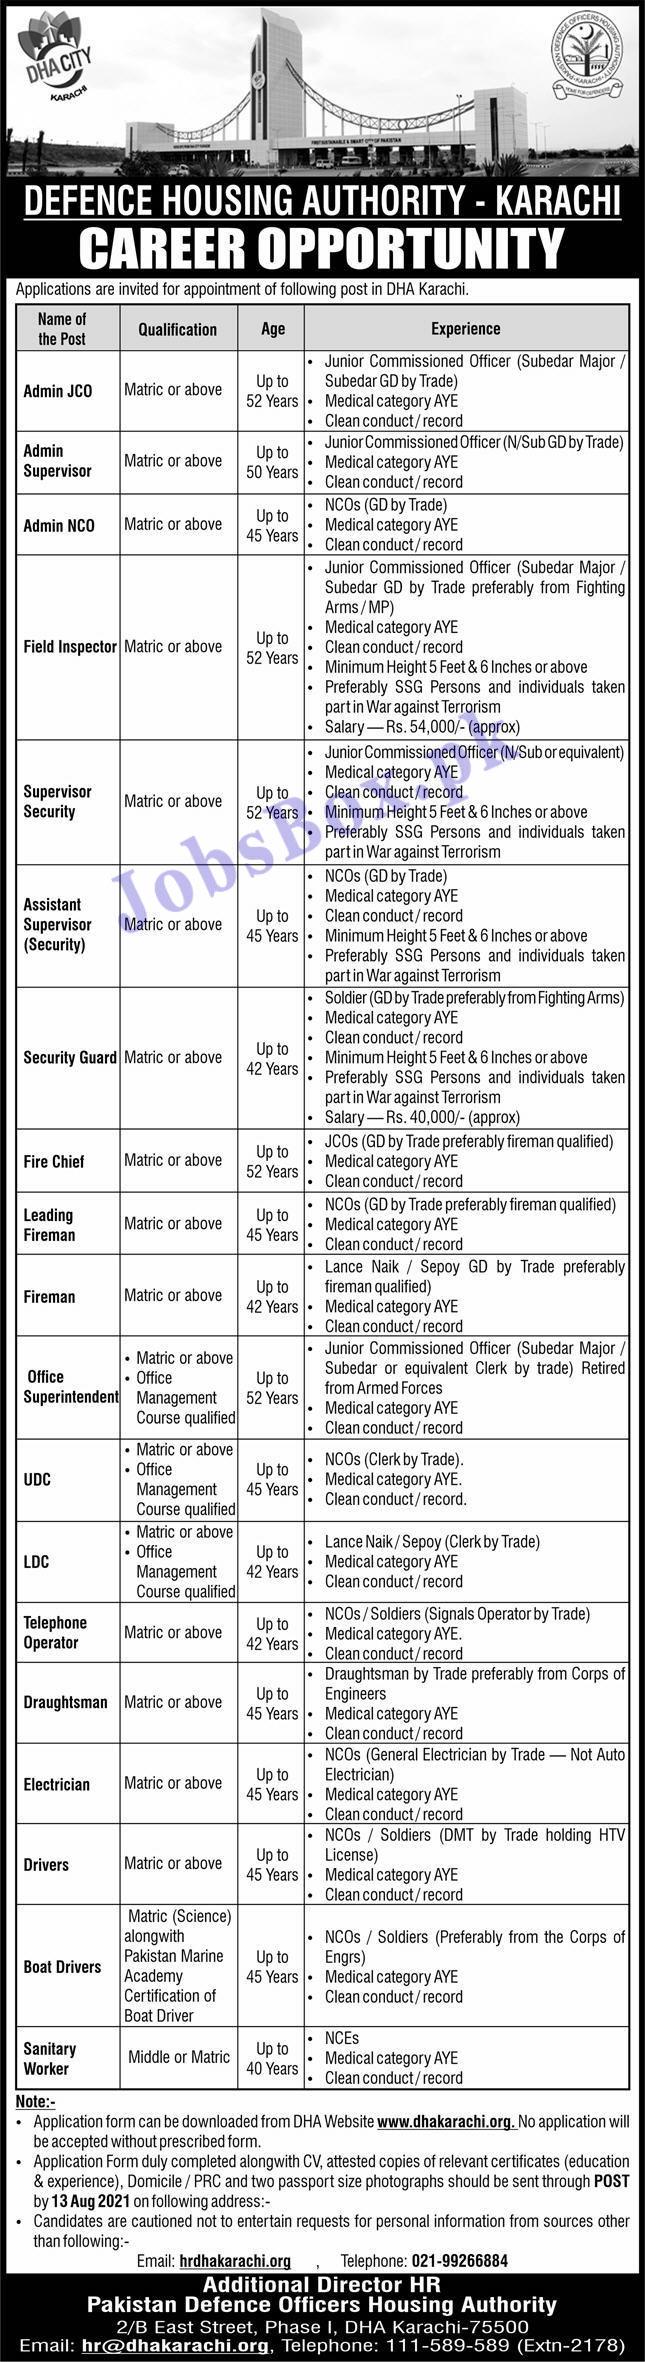 Defence Housing Authority DHA Karachi Jobs 2021 – www.dhakarachi.org